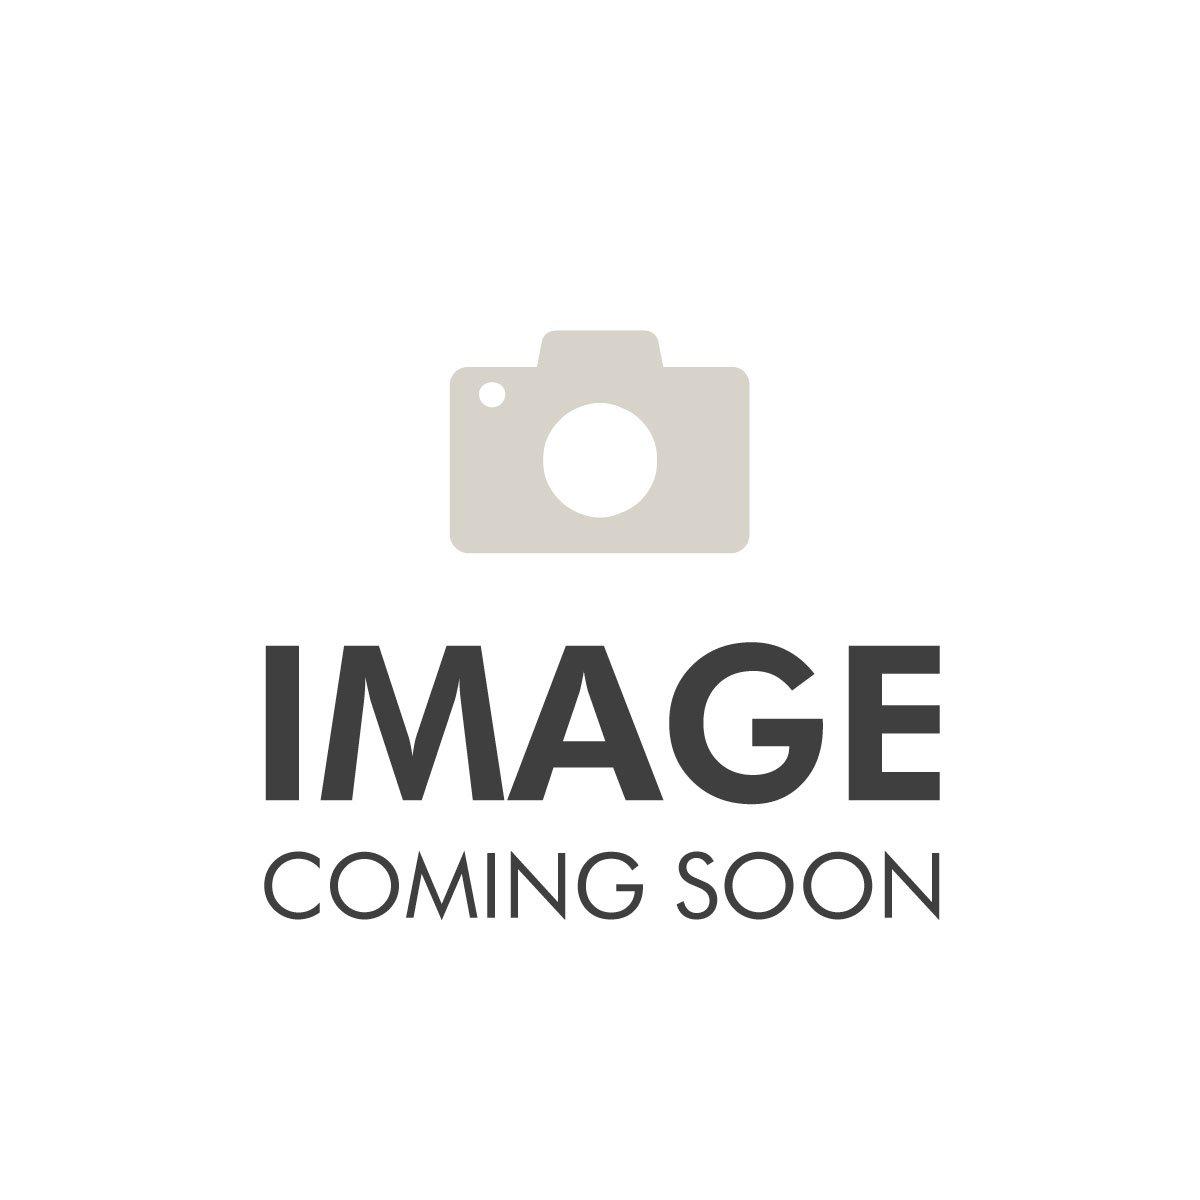 La Prairie Anti Aging Eye Cream SPF15 - 15ml